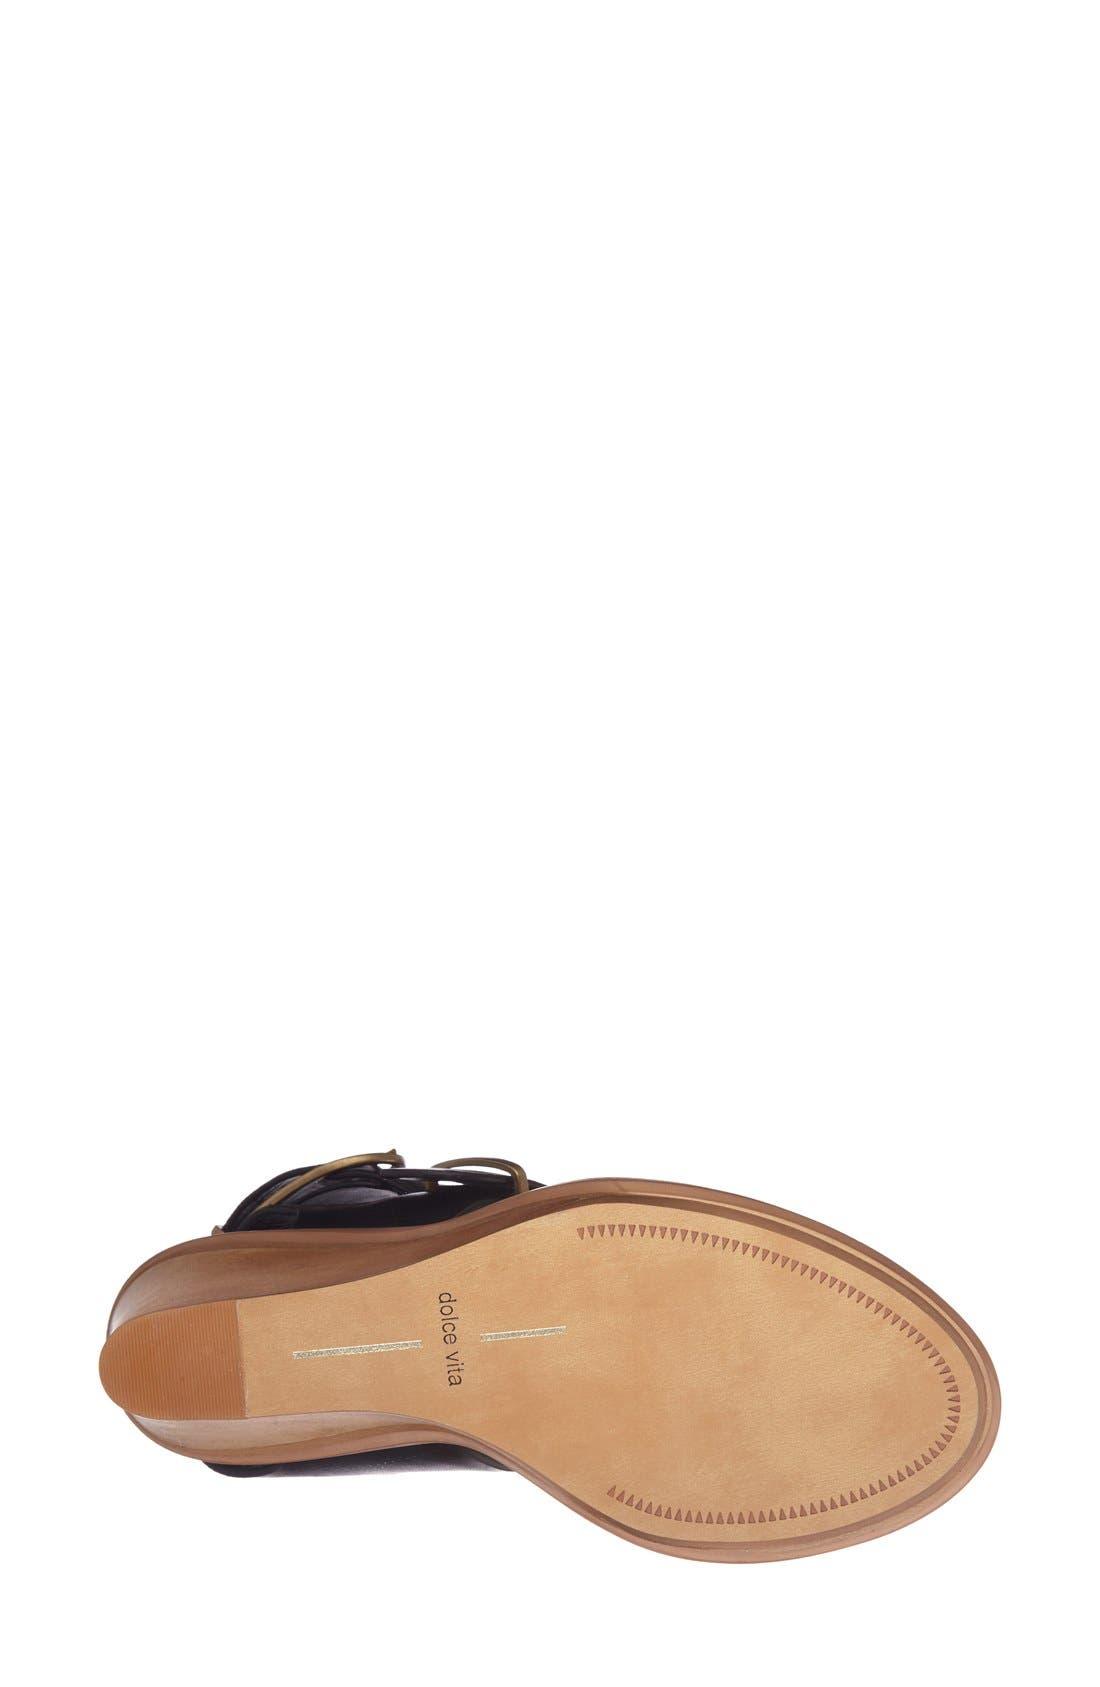 'Julissa' Wedge Sandal,                             Alternate thumbnail 2, color,                             Black